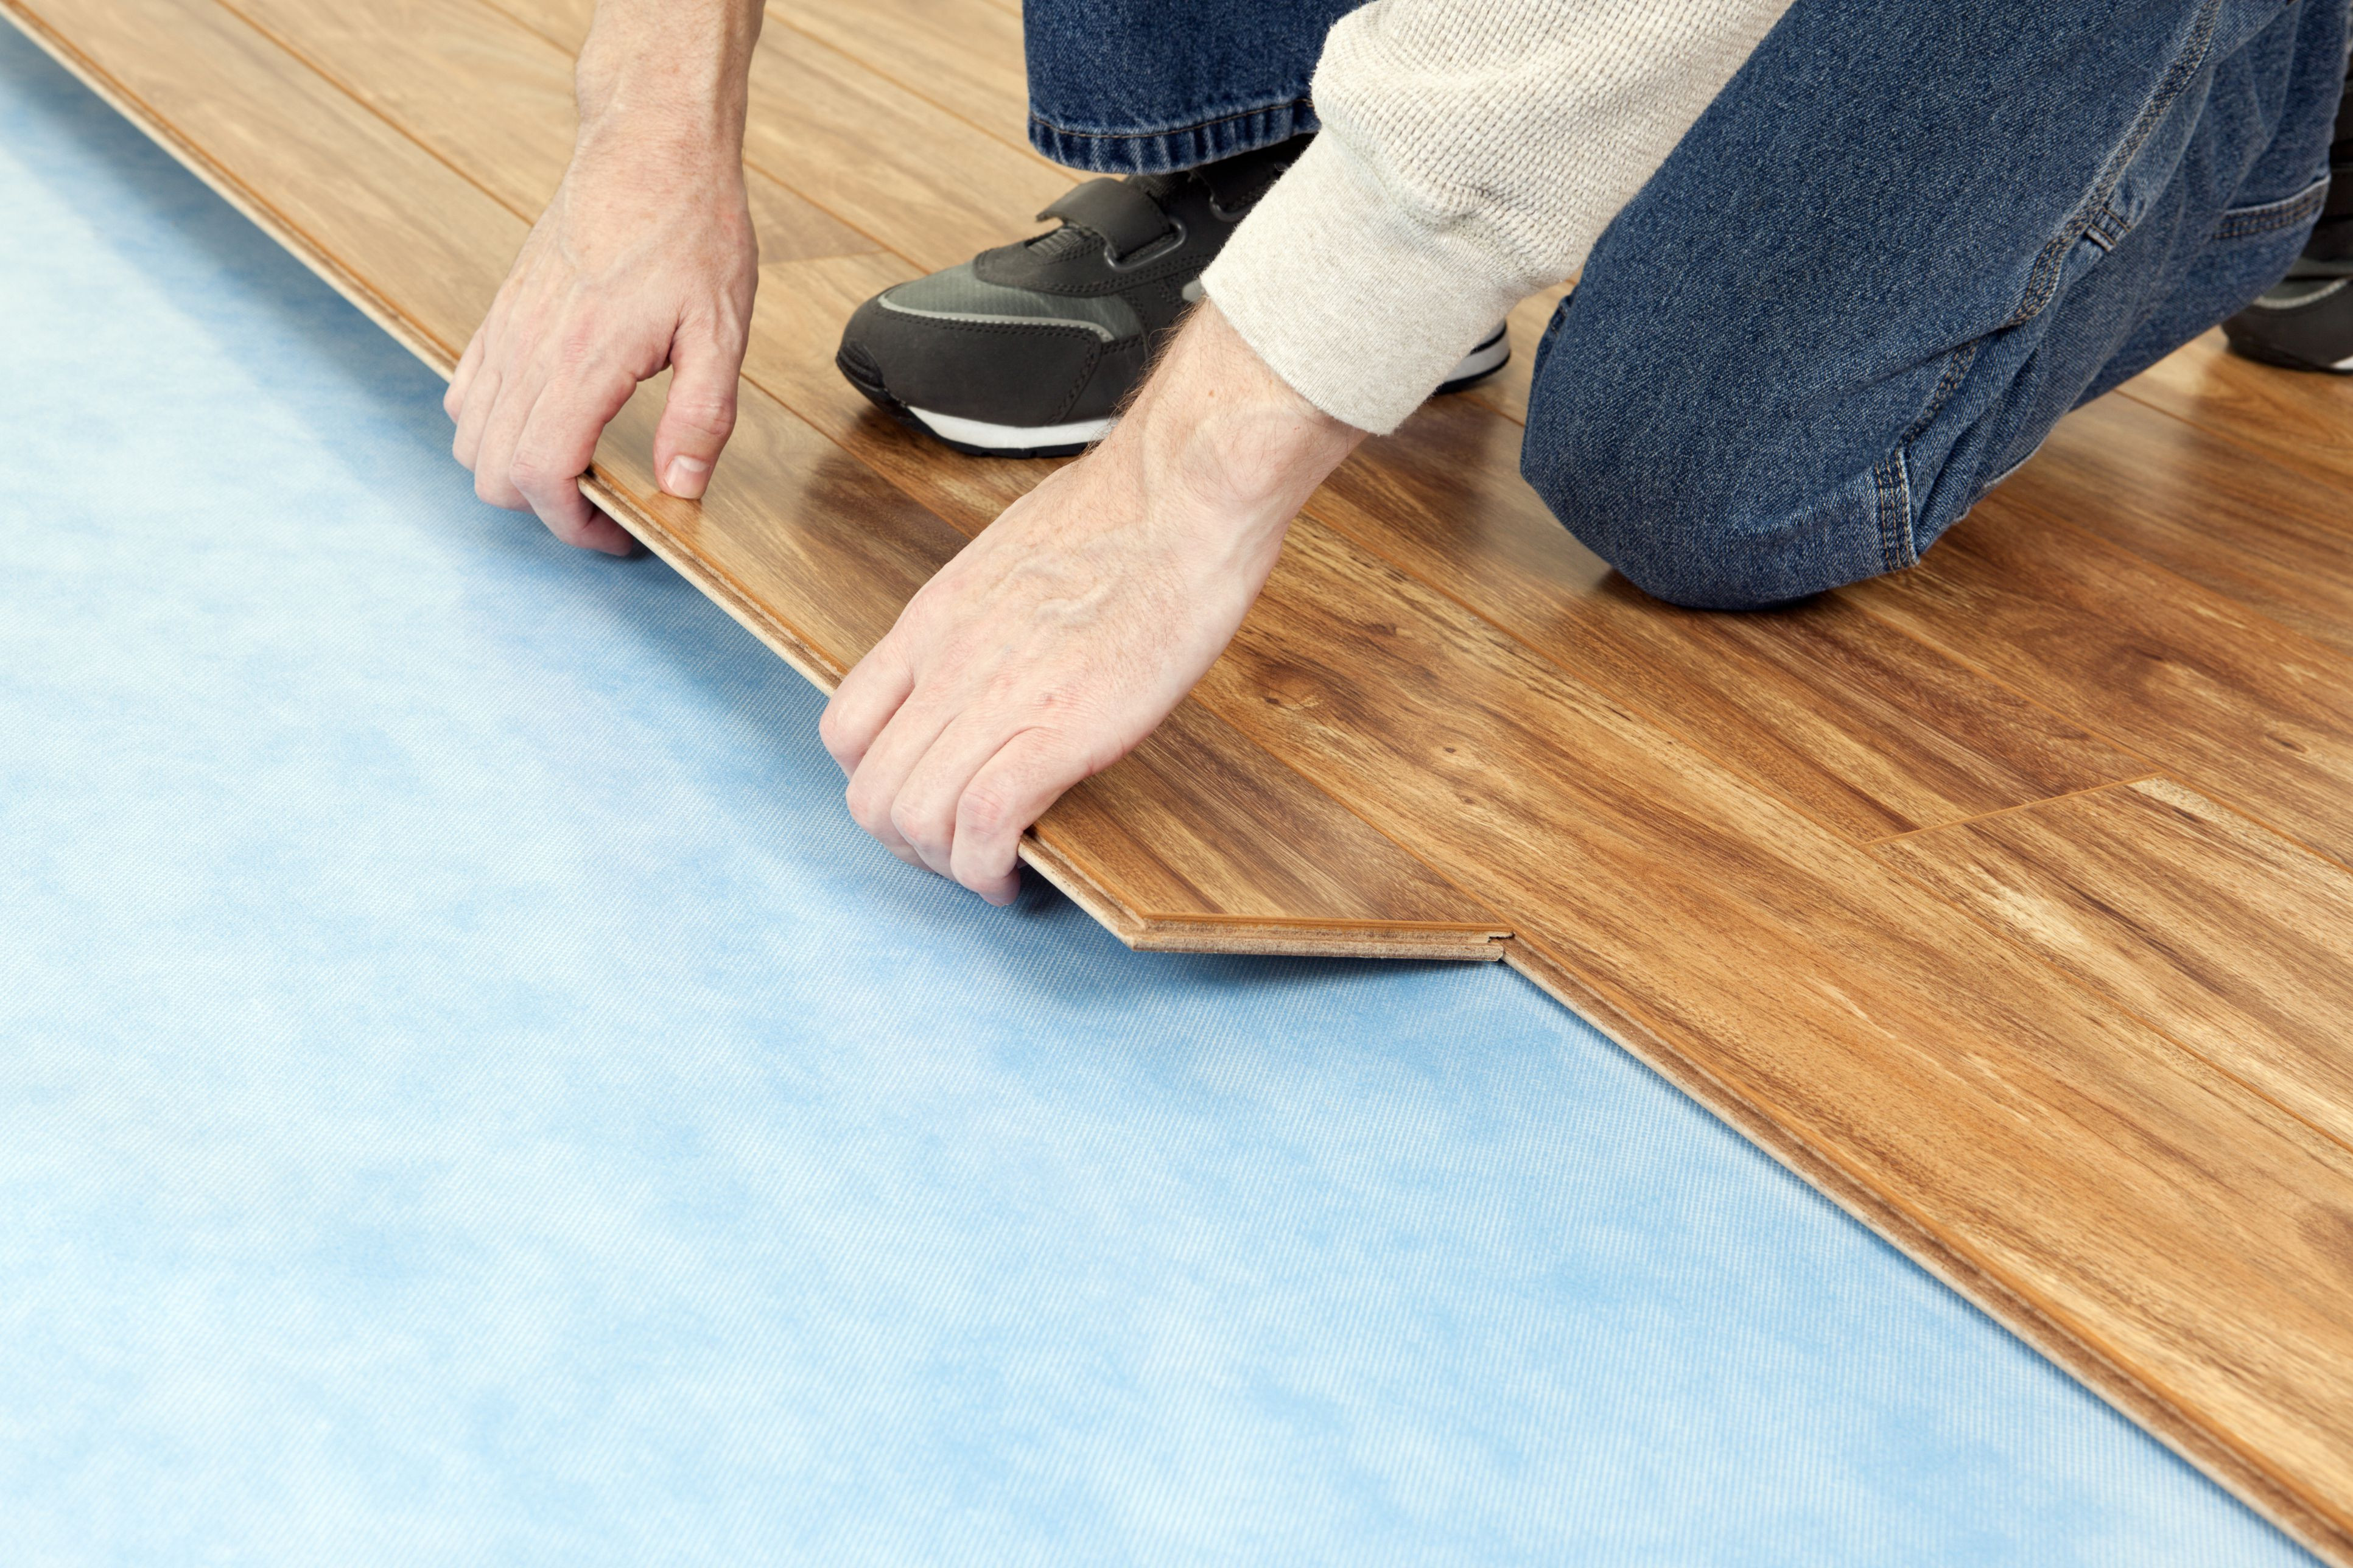 bruce locking engineered hardwood flooring of flooring underlayment the basics intended for new floor installation 185270632 582b722c3df78c6f6af0a8ab